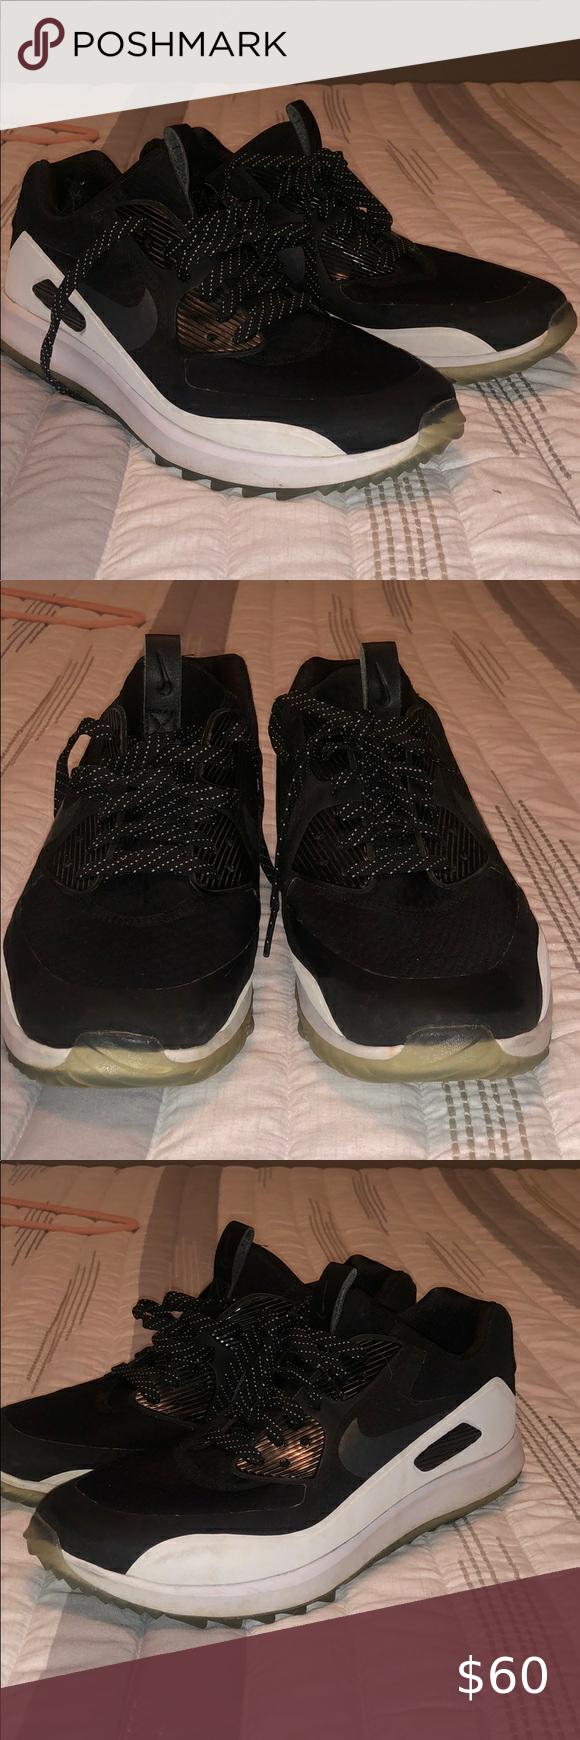 Predownload: Nike Zoom Airmax 90 Golf Shoe Nike Zoom Golf Shoes Black Nikes [ 1740 x 580 Pixel ]